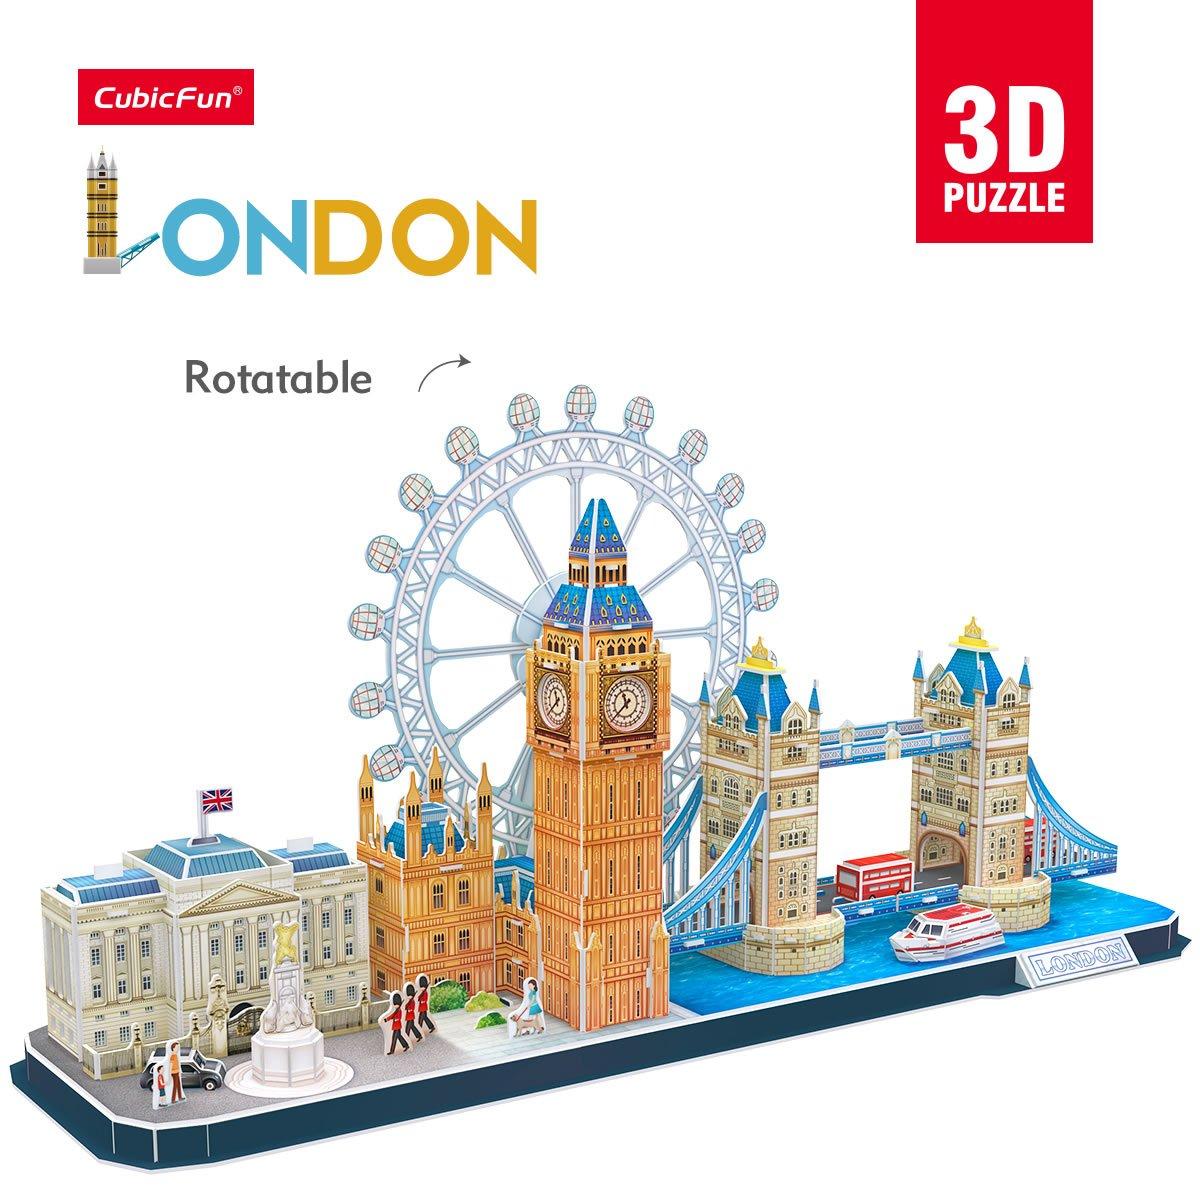 107 Pezzi CubicFun Puzzle 3D UK London Bridge Big Ben City Skyline Building Model Kit Regalo e Souvenir per Adulti e Bambini